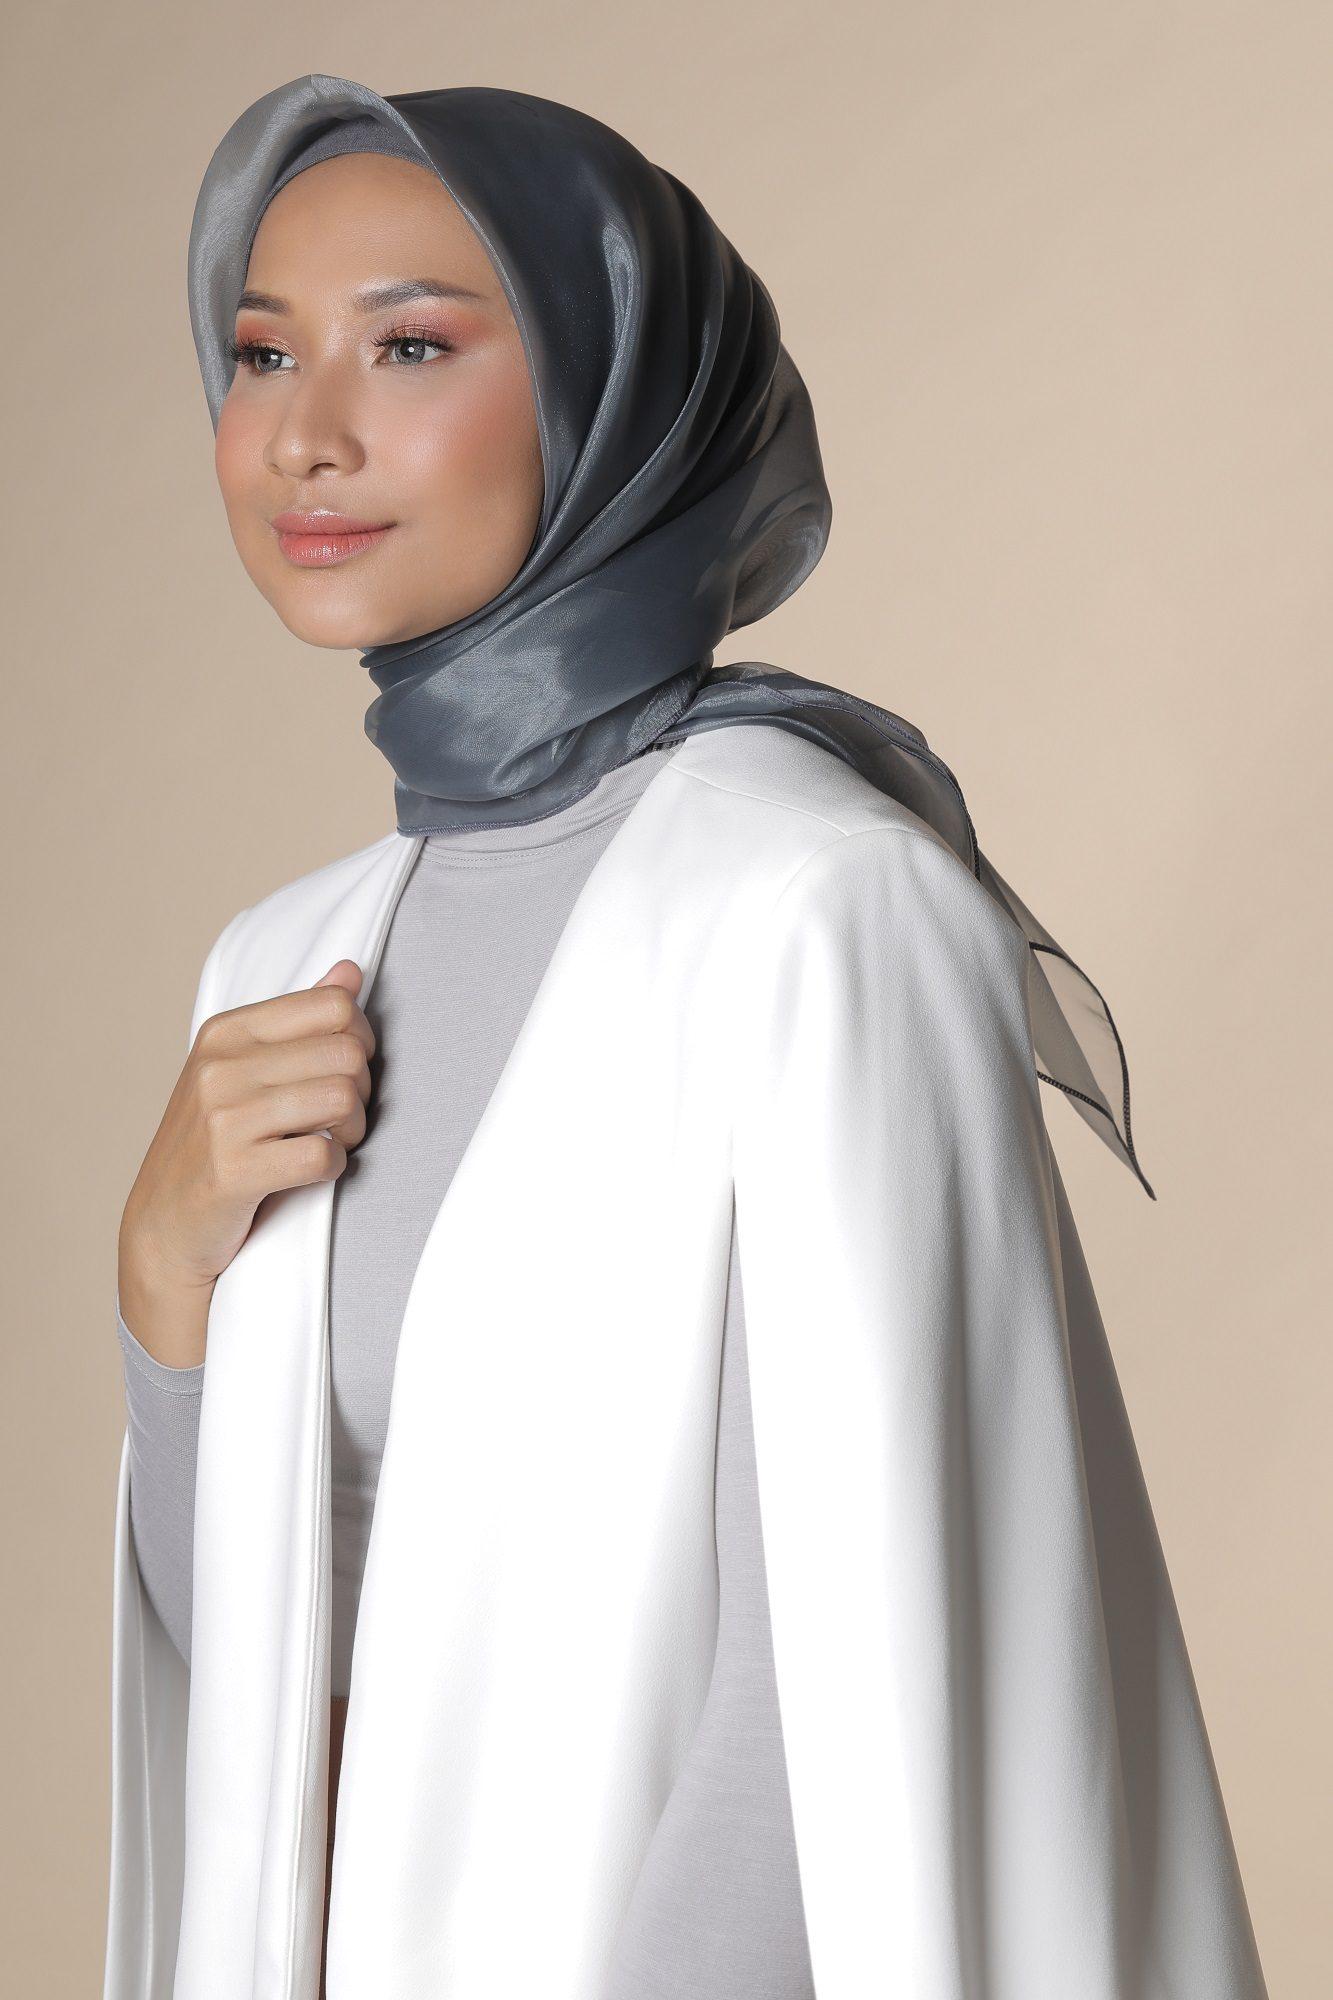 Wanita Asia memakai hijab abu-abu